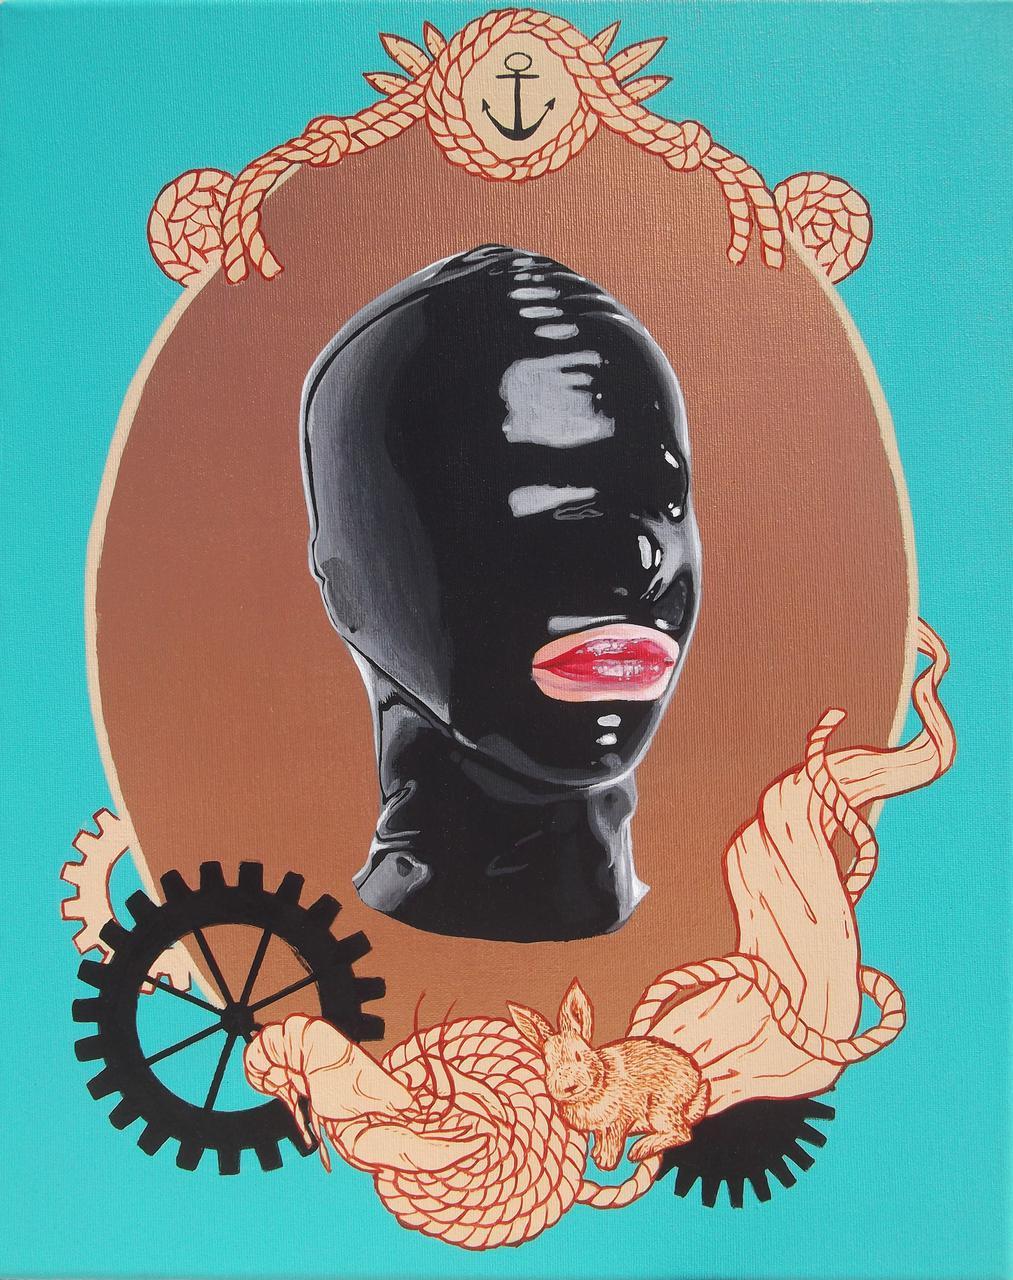 Anti-Portrait, acrylic on canvas, 50x 40 cm